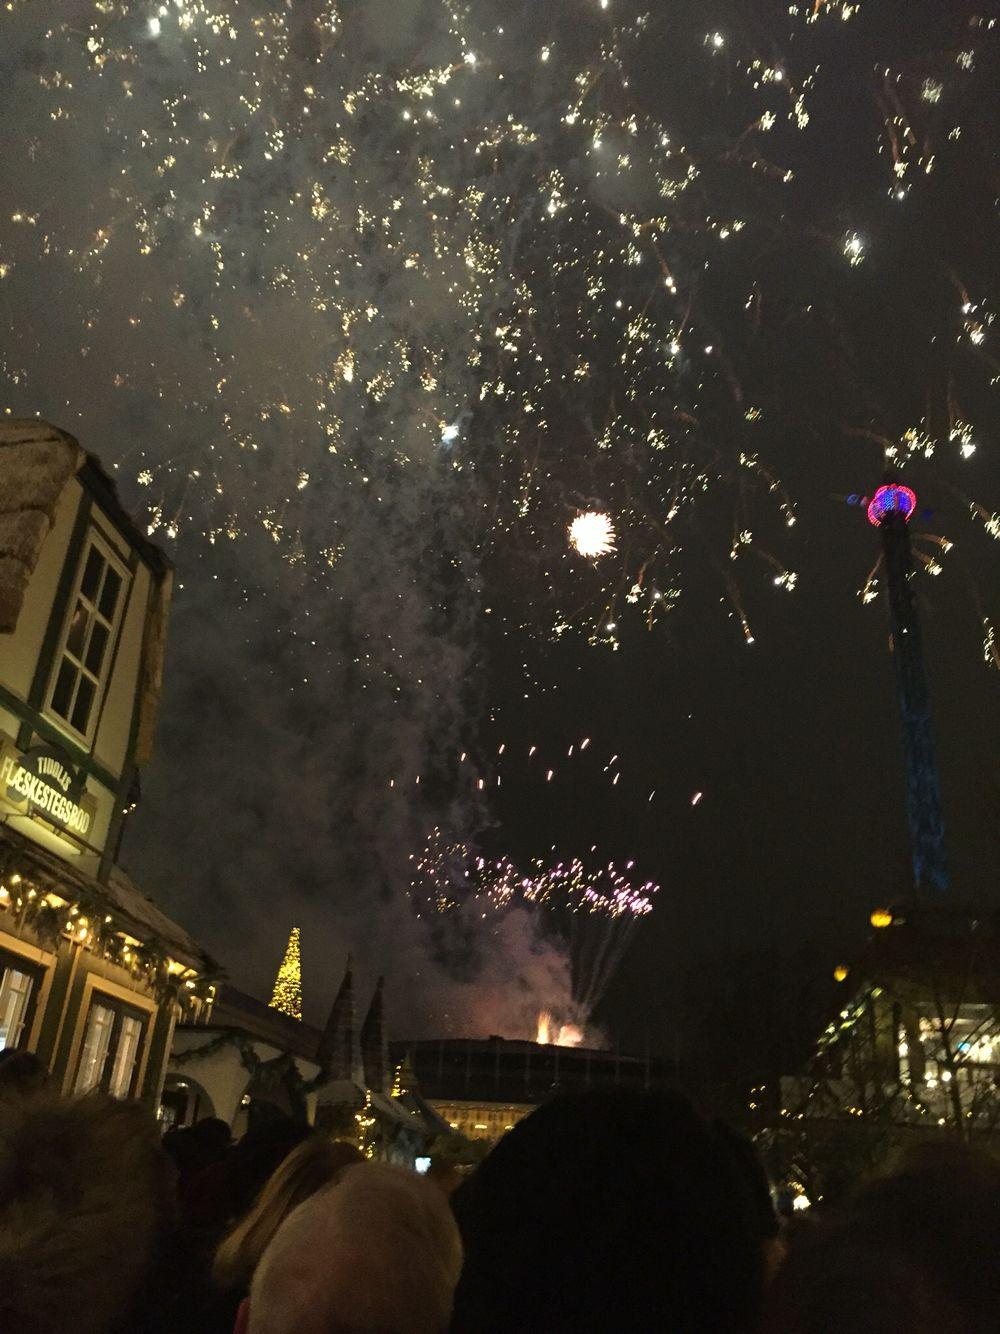 New Years Eve fireworks at Tivoli